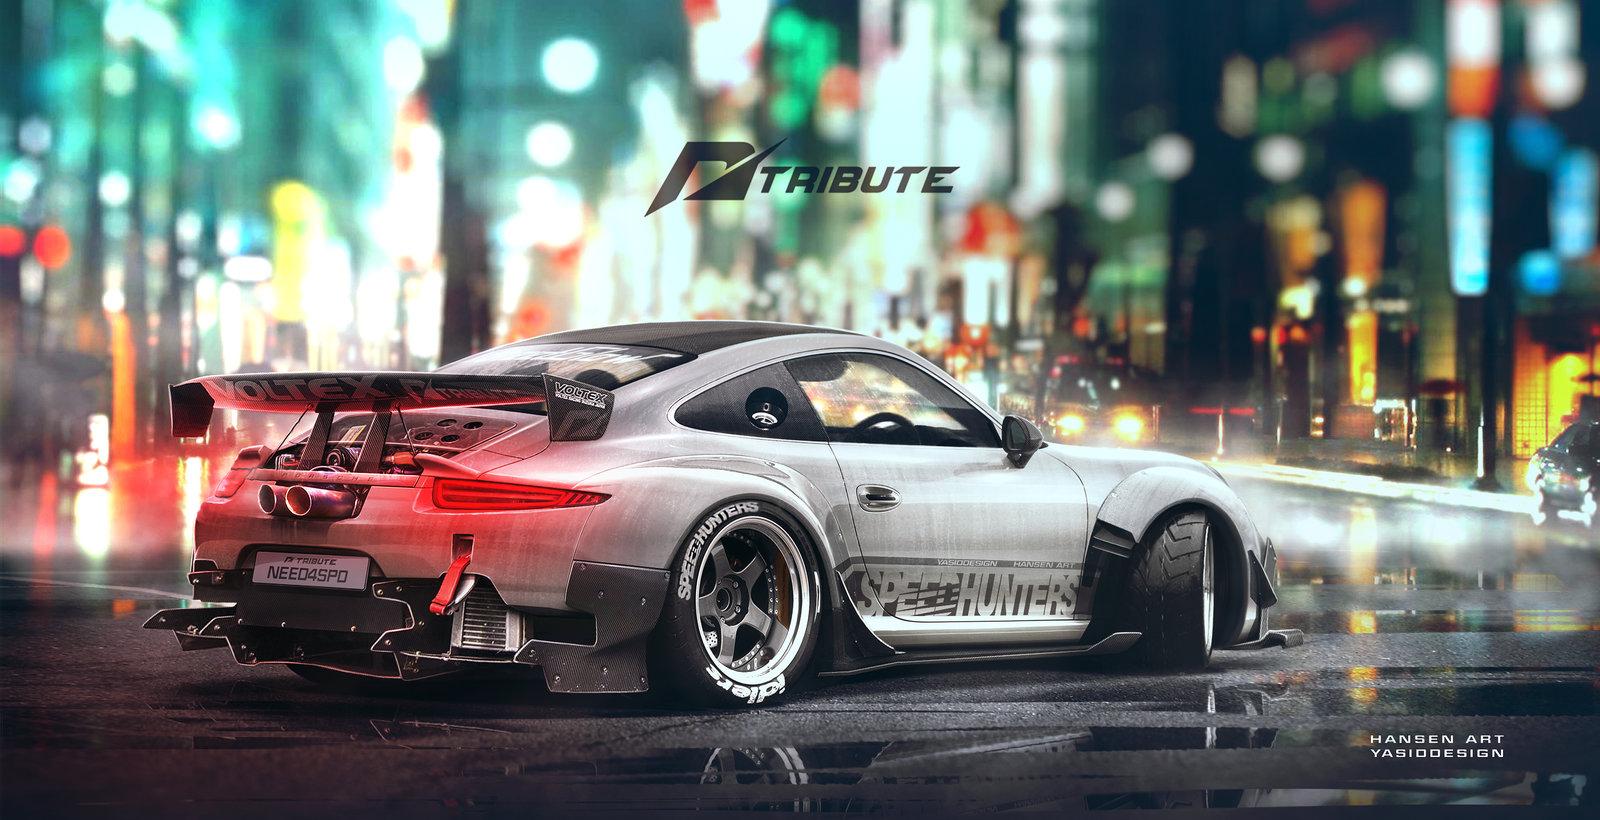 Speedhunters Porsche 911 - Need for Speed Tribute